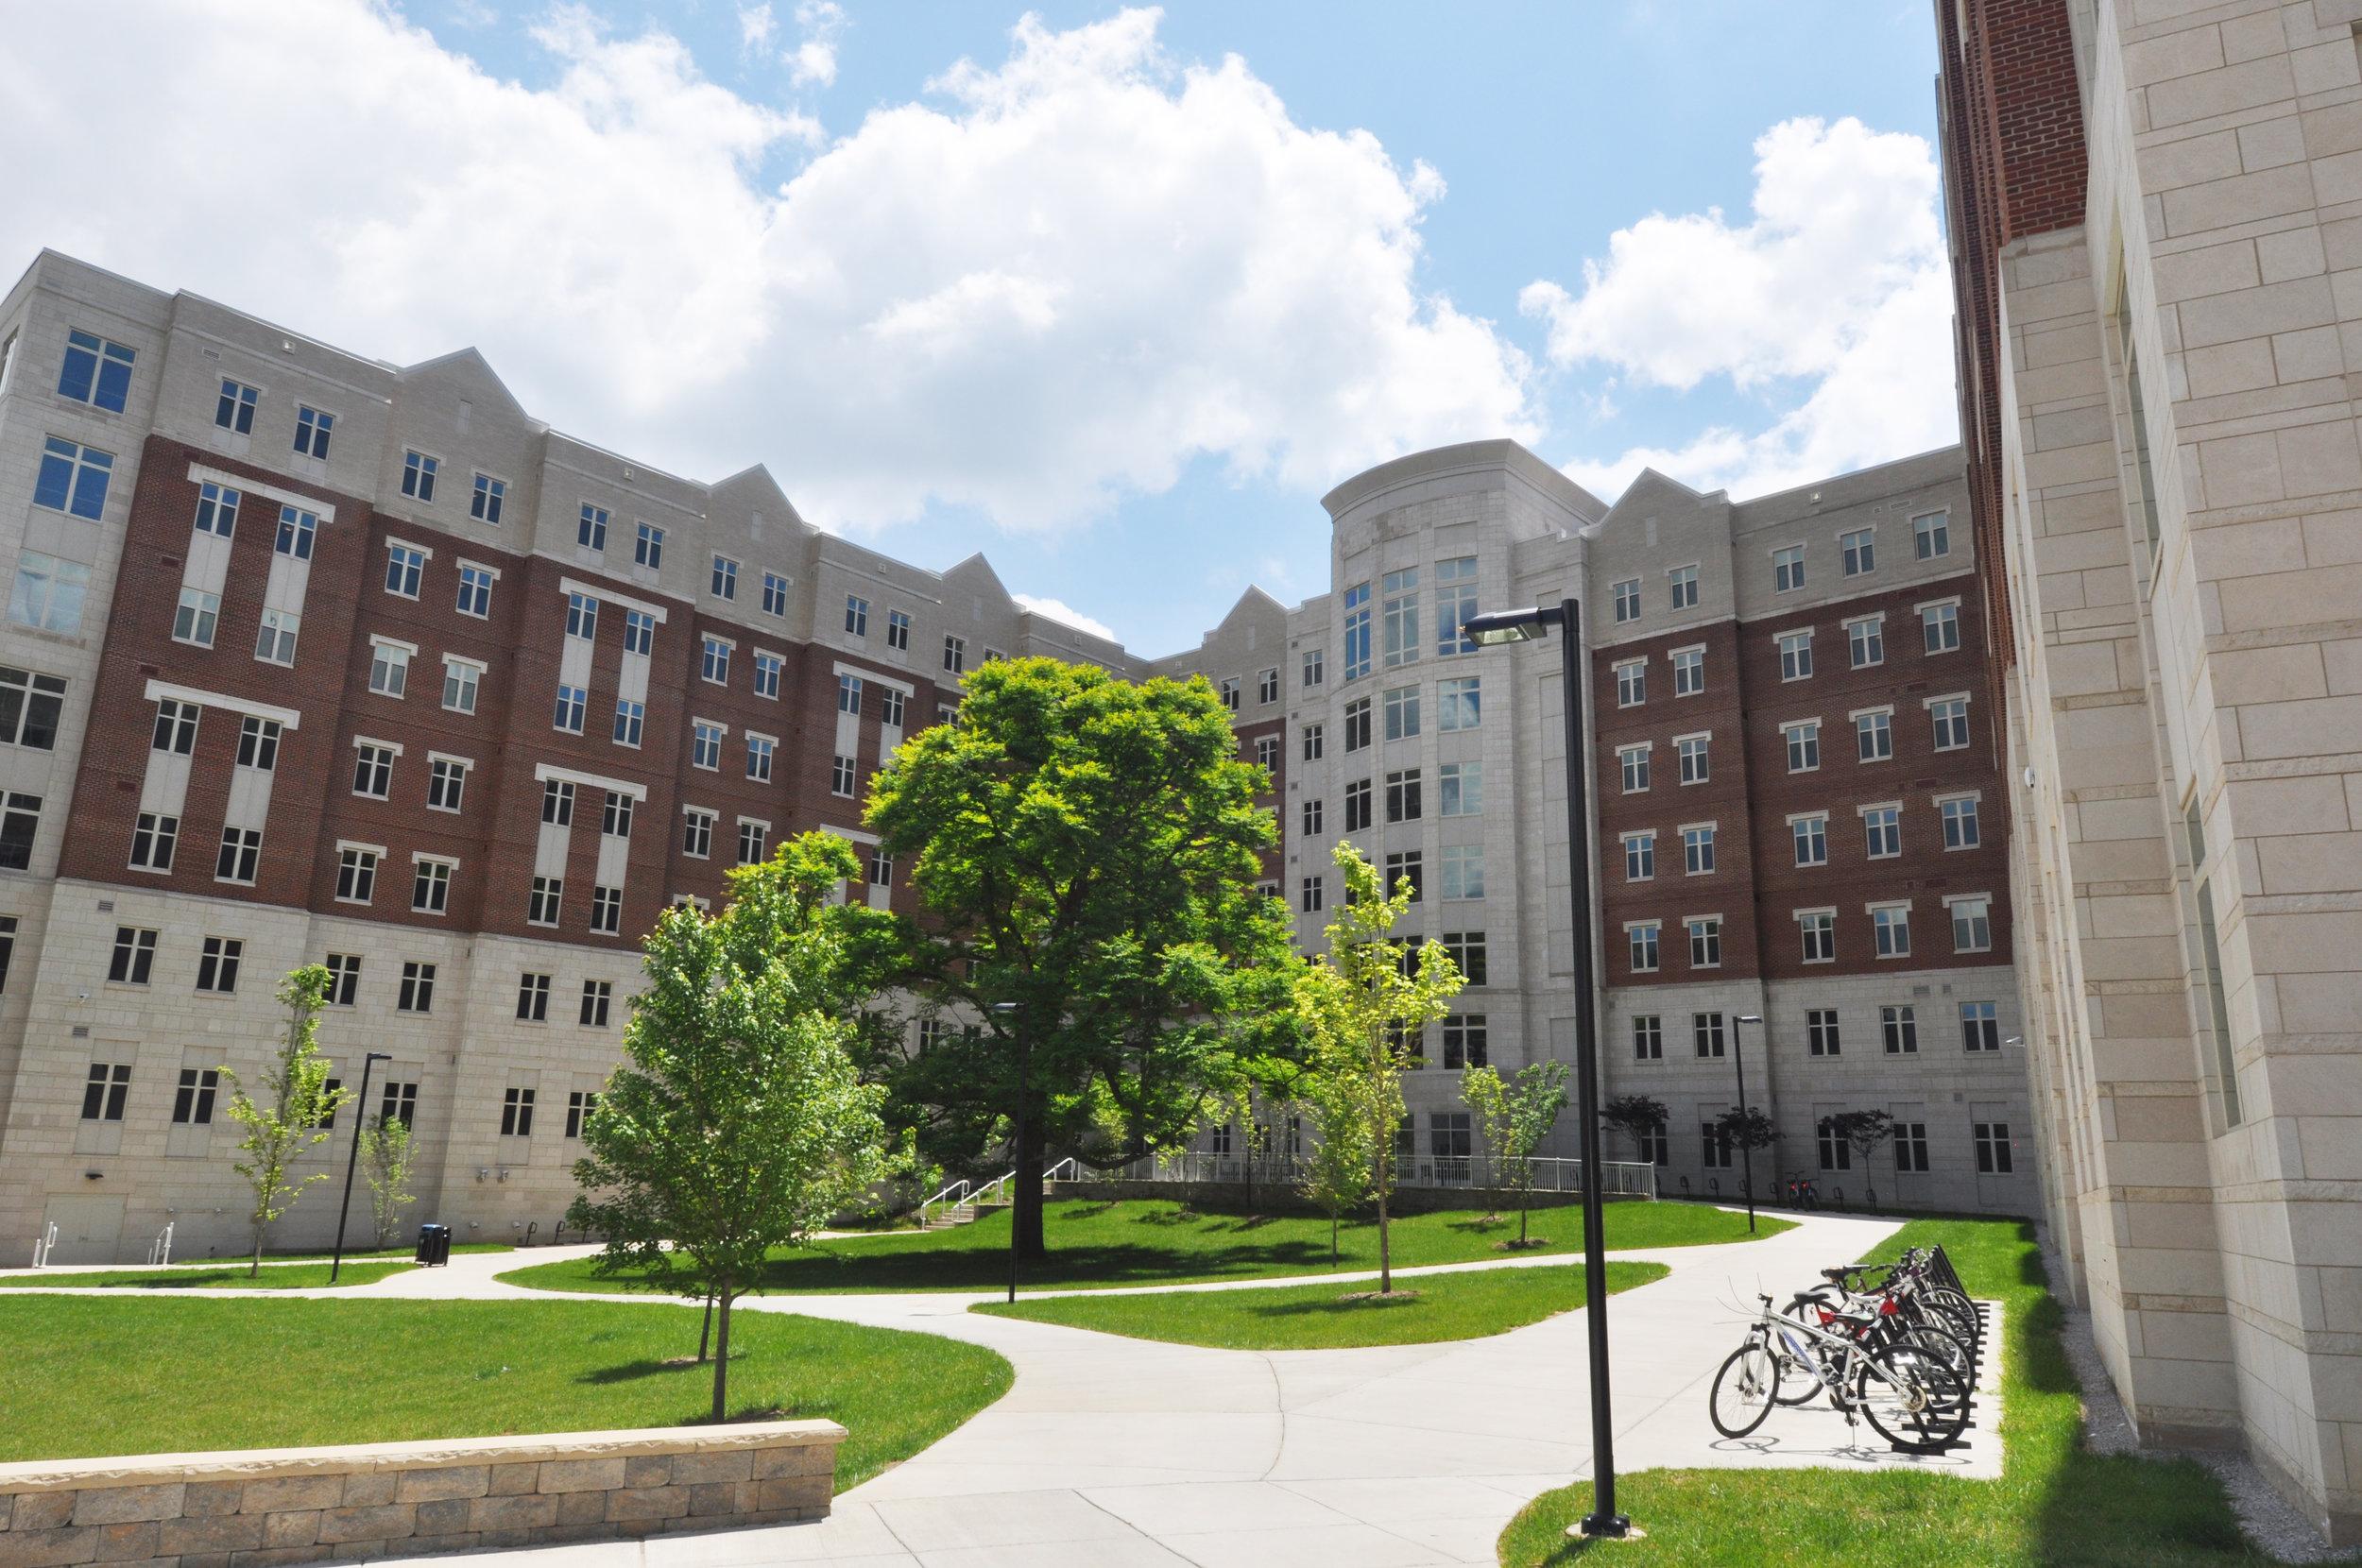 University of Kentucky - Woodland Glen 3, 4, & 5